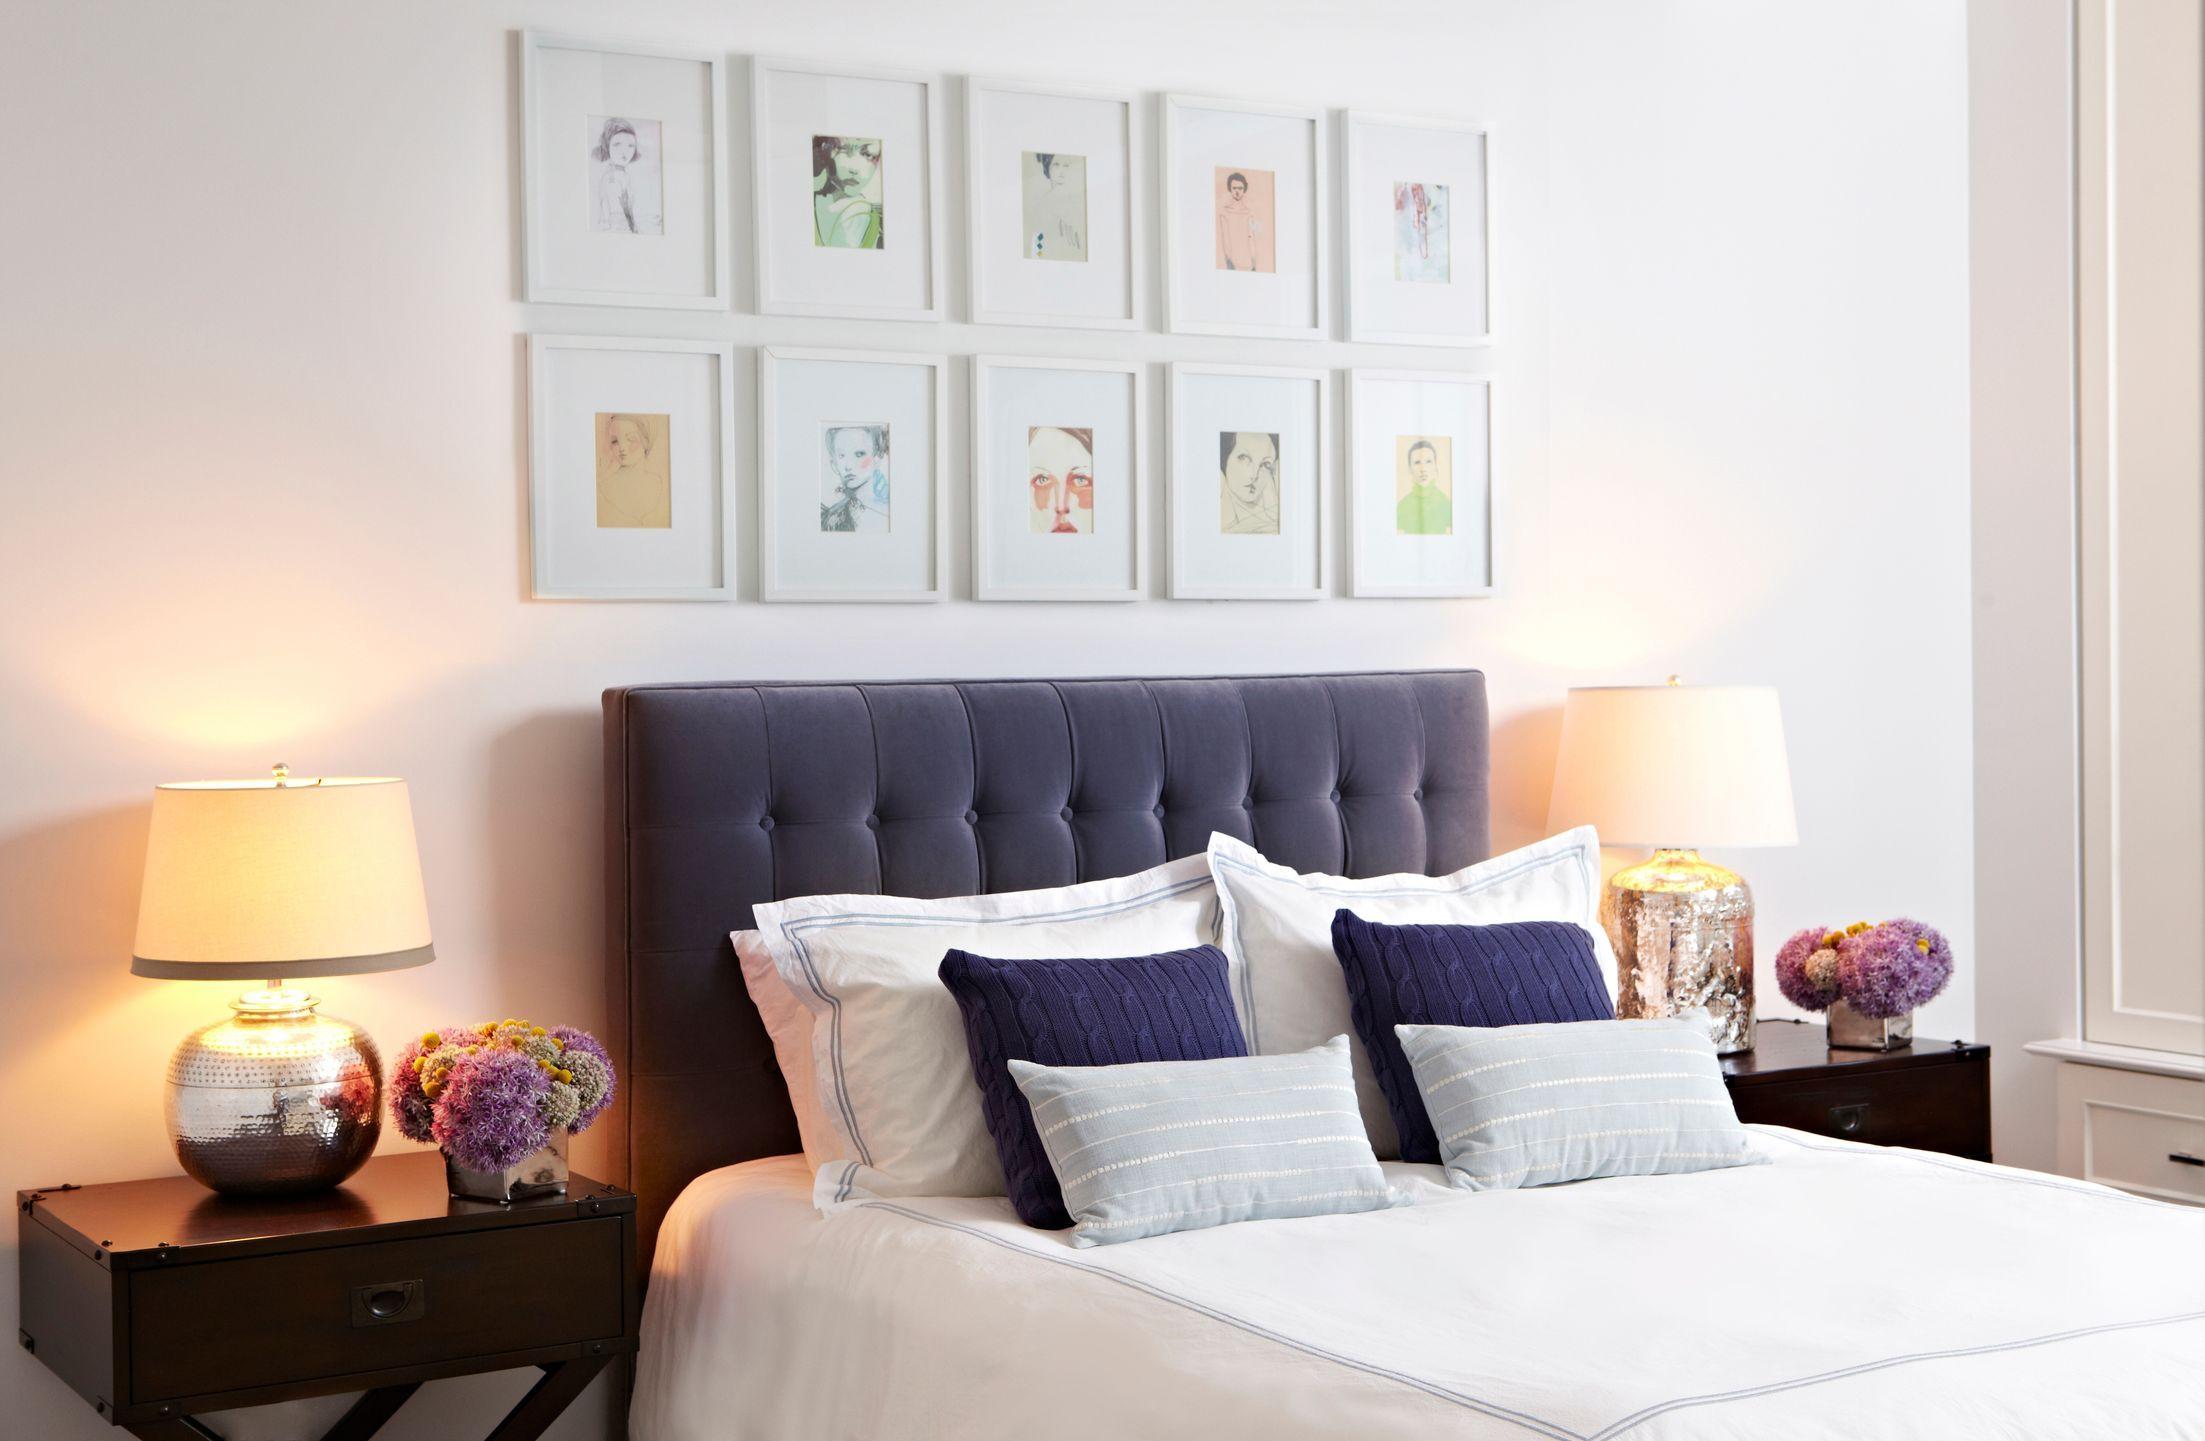 Master bedroom headboard design ideas   Central Park West by Chango Co   Contemporary  Bedroom